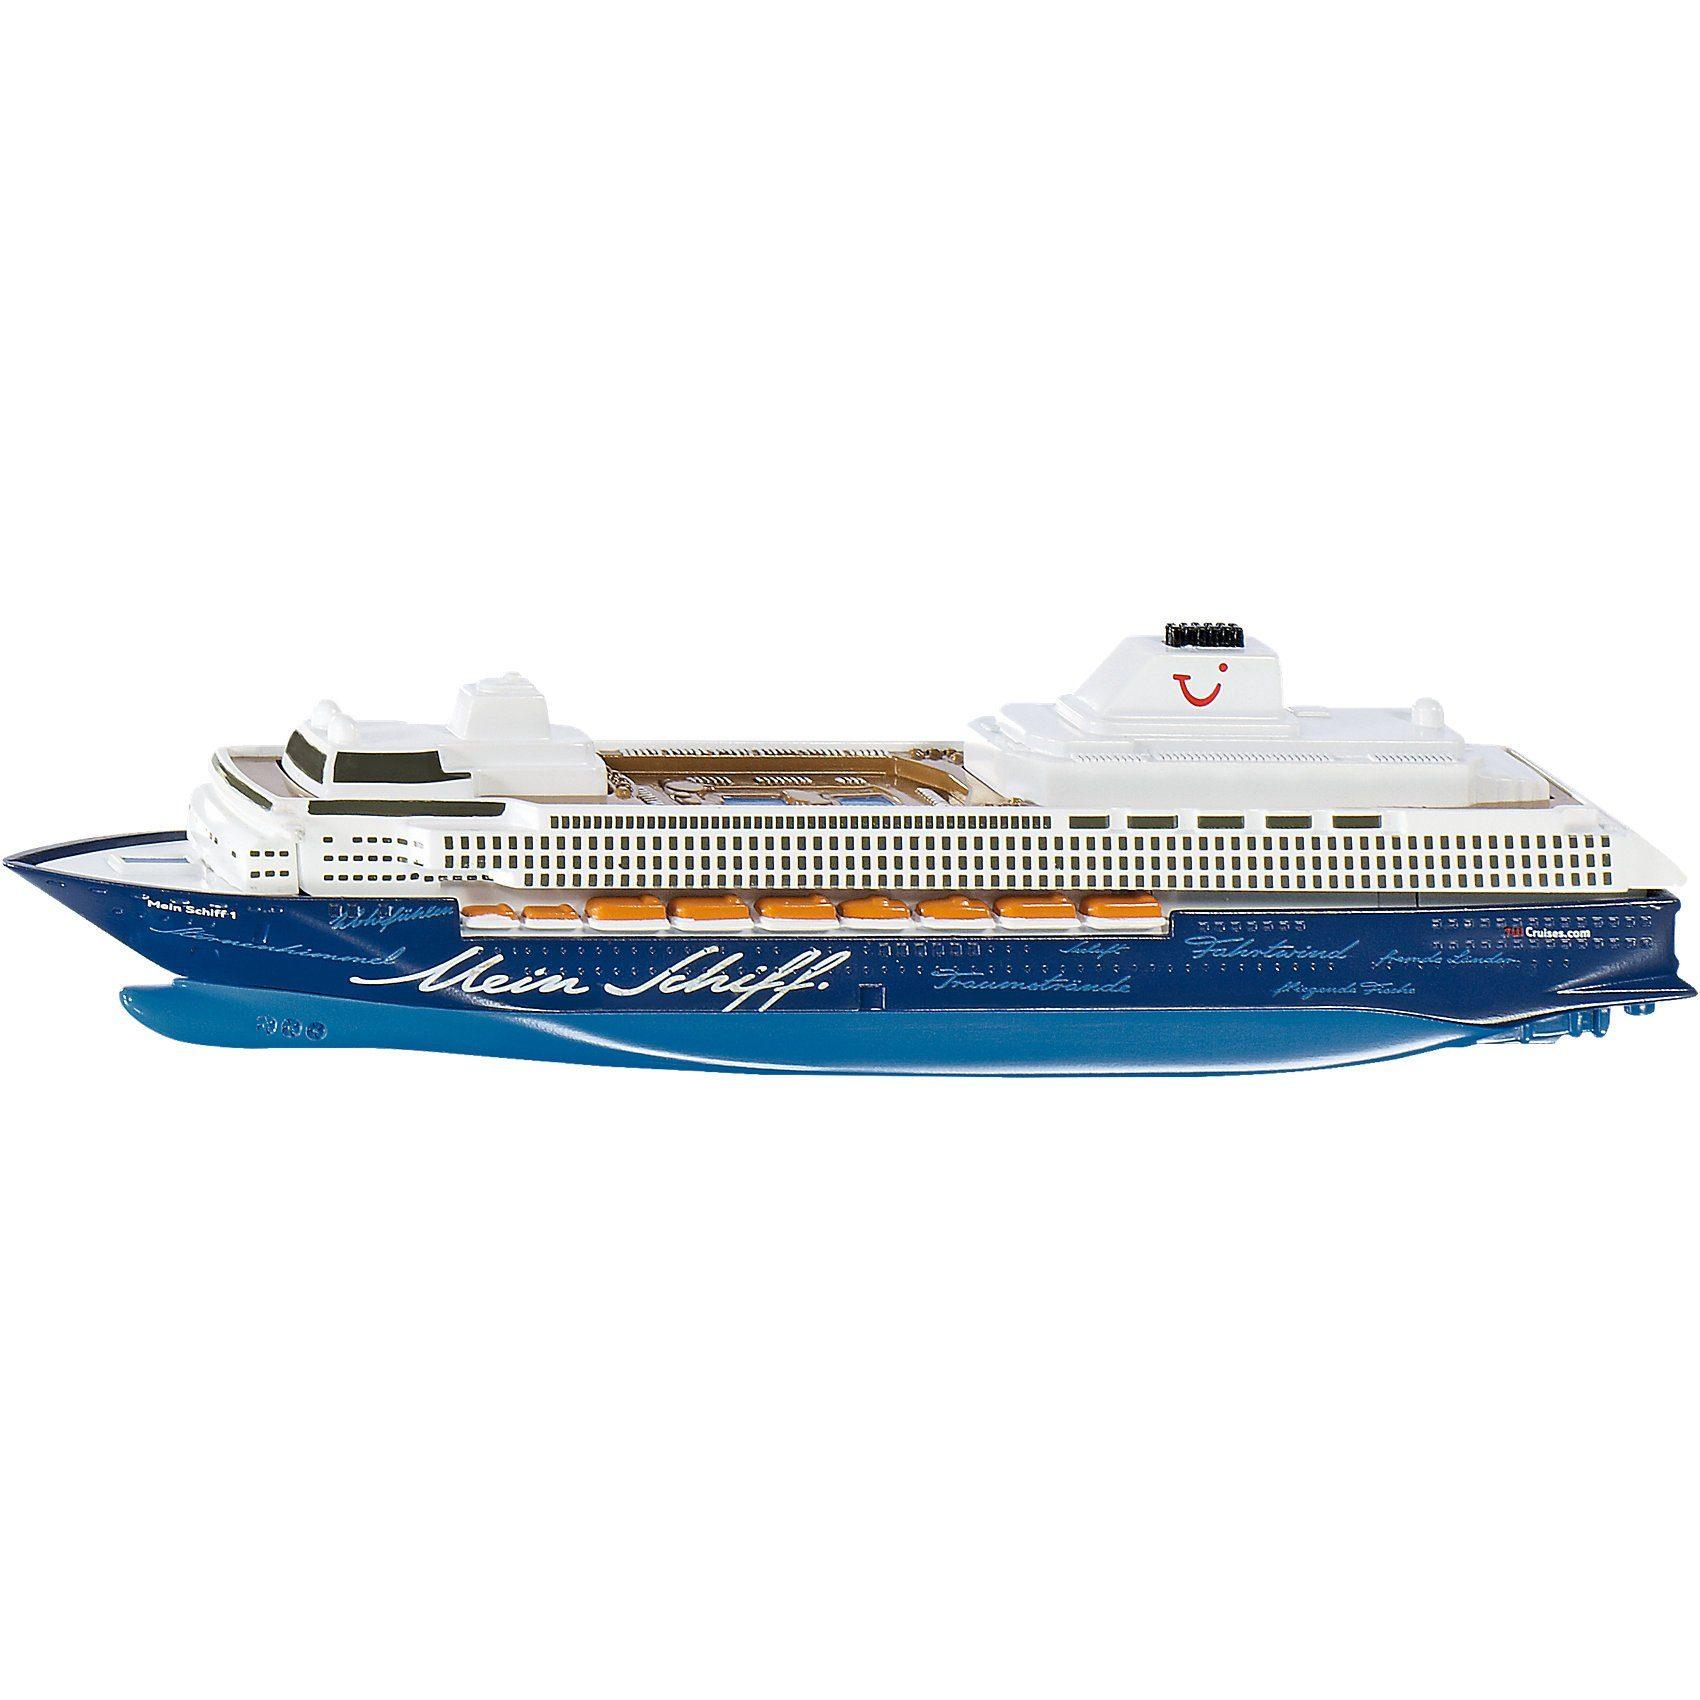 SIKU 1726 Mein Schiff 1, 1:1400